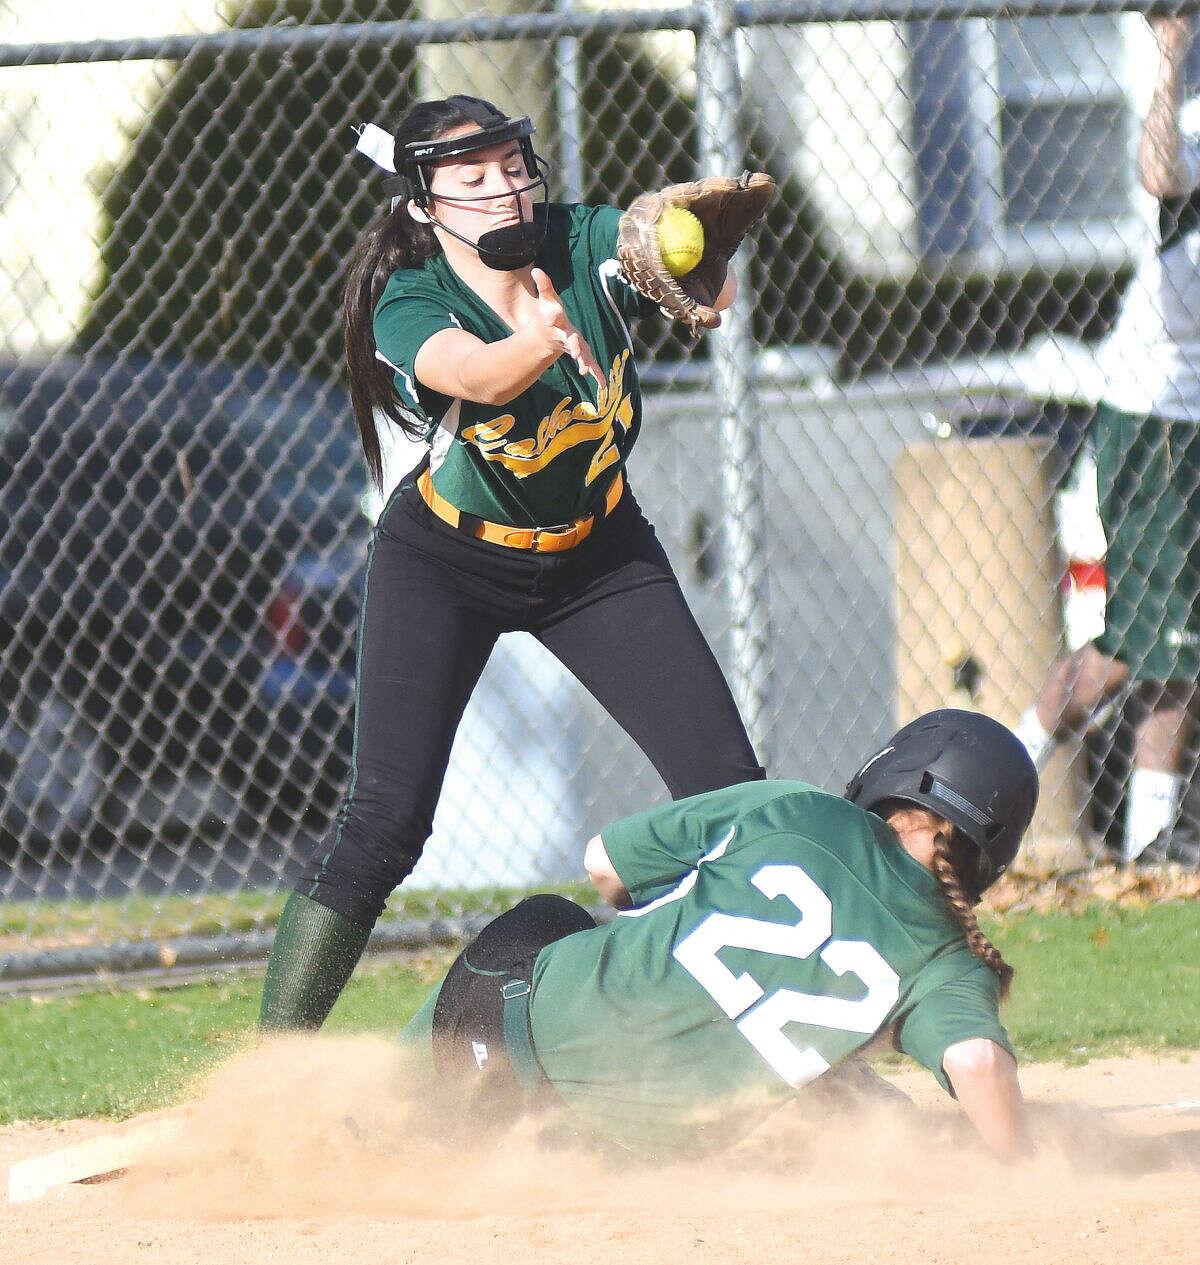 Norwalk's Katie Sciglimpaglia slides into third base against Trinity Catholic on Wednesday. (John Nash/Hour photo)